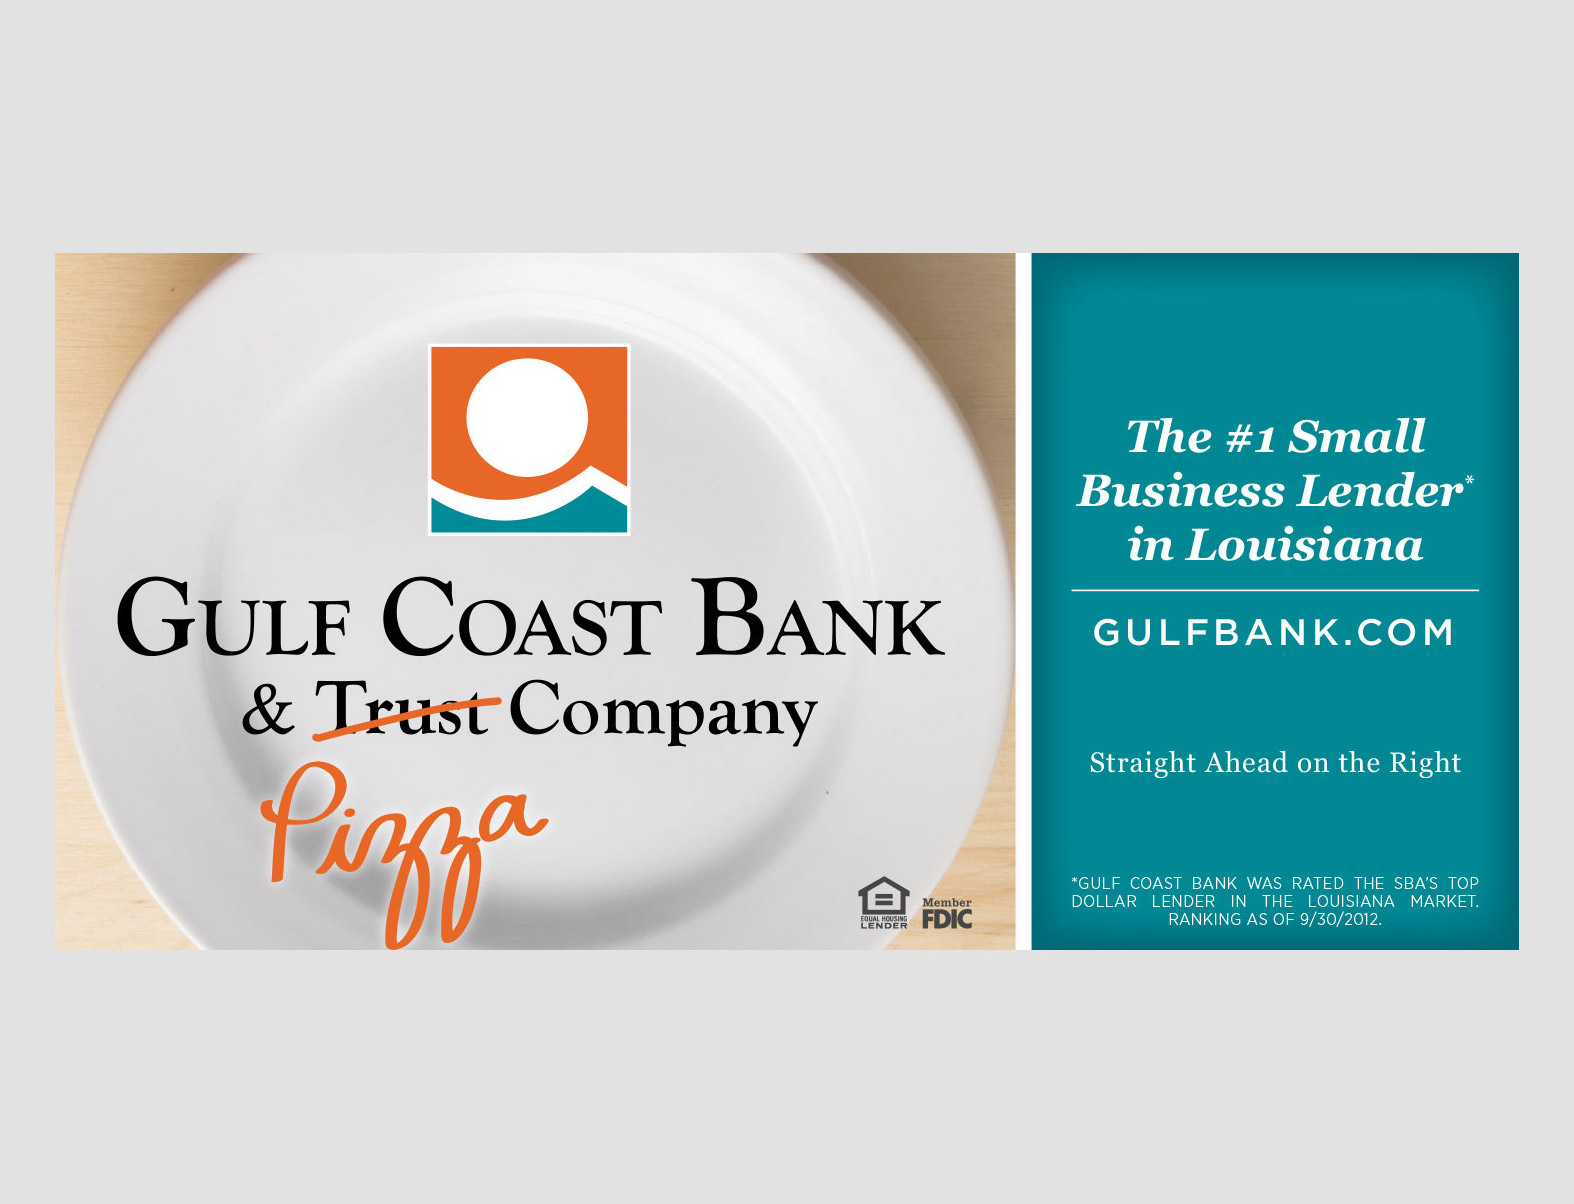 OUTDOOR_Gulf-Coast-Bank-Digital-Poster-Pizza.jpg